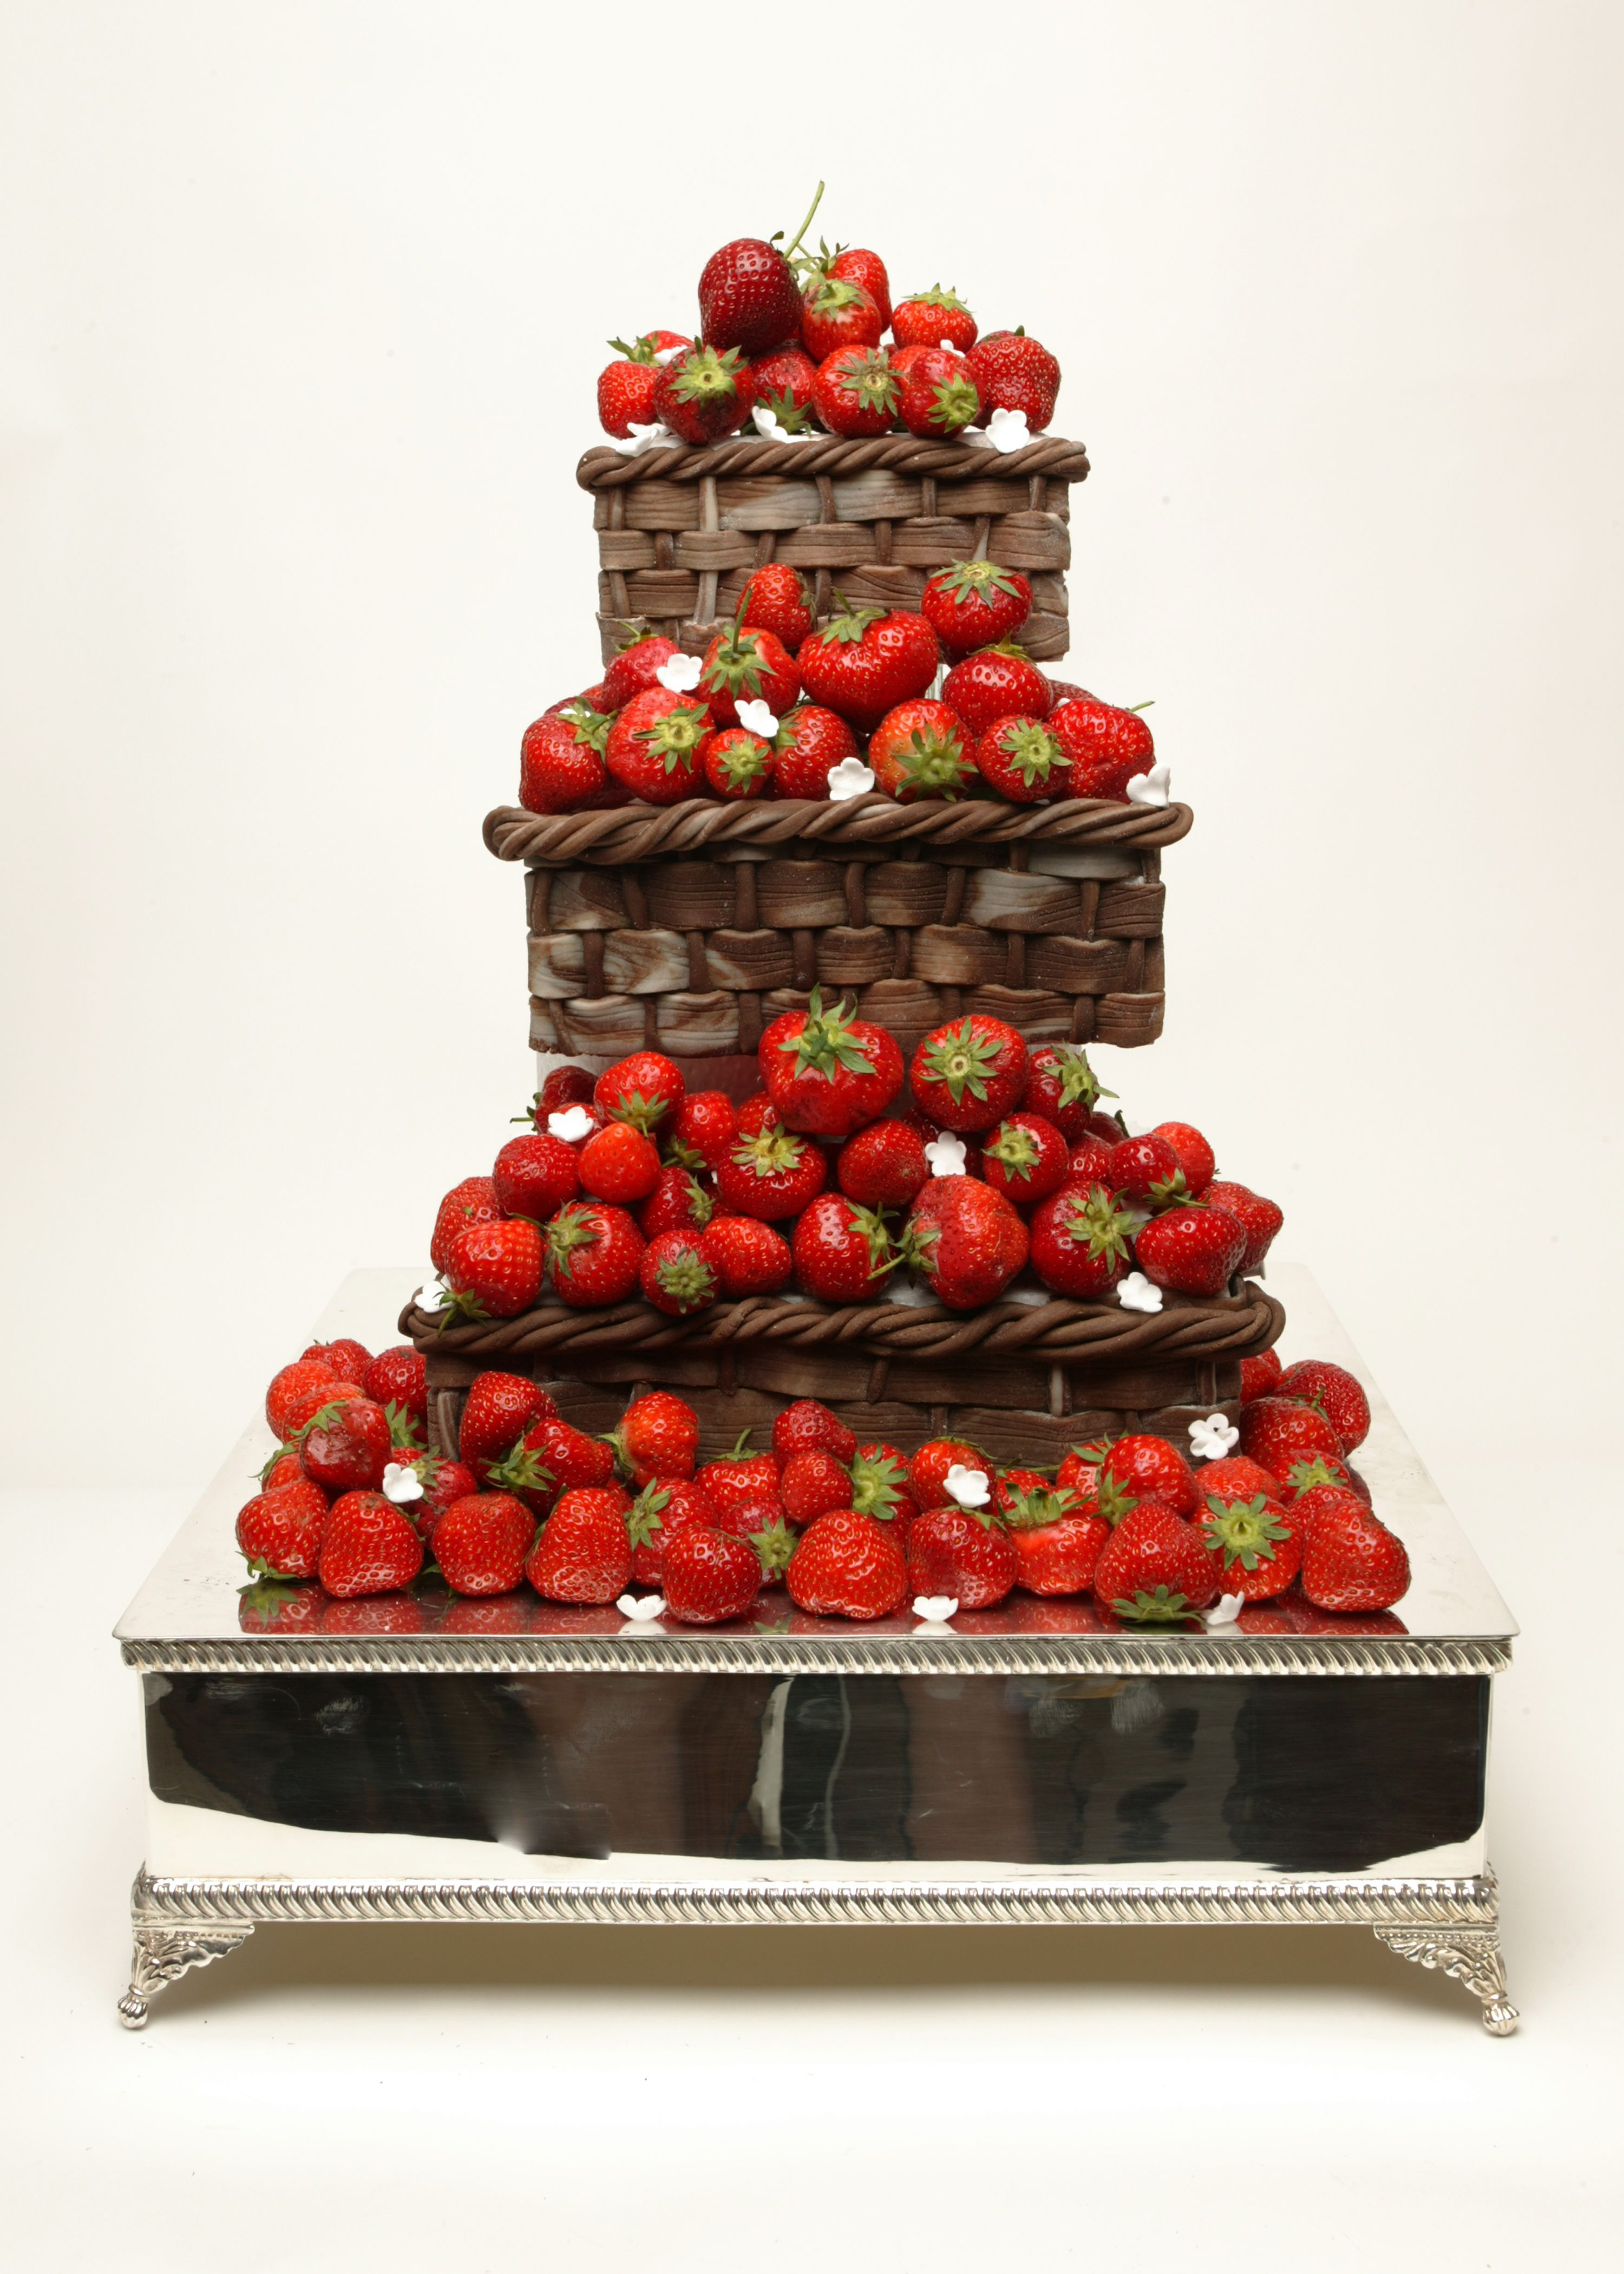 Strawberry Basket Cake by Tartufi Cakes | Photo Shoot Ideas | Pintere ...